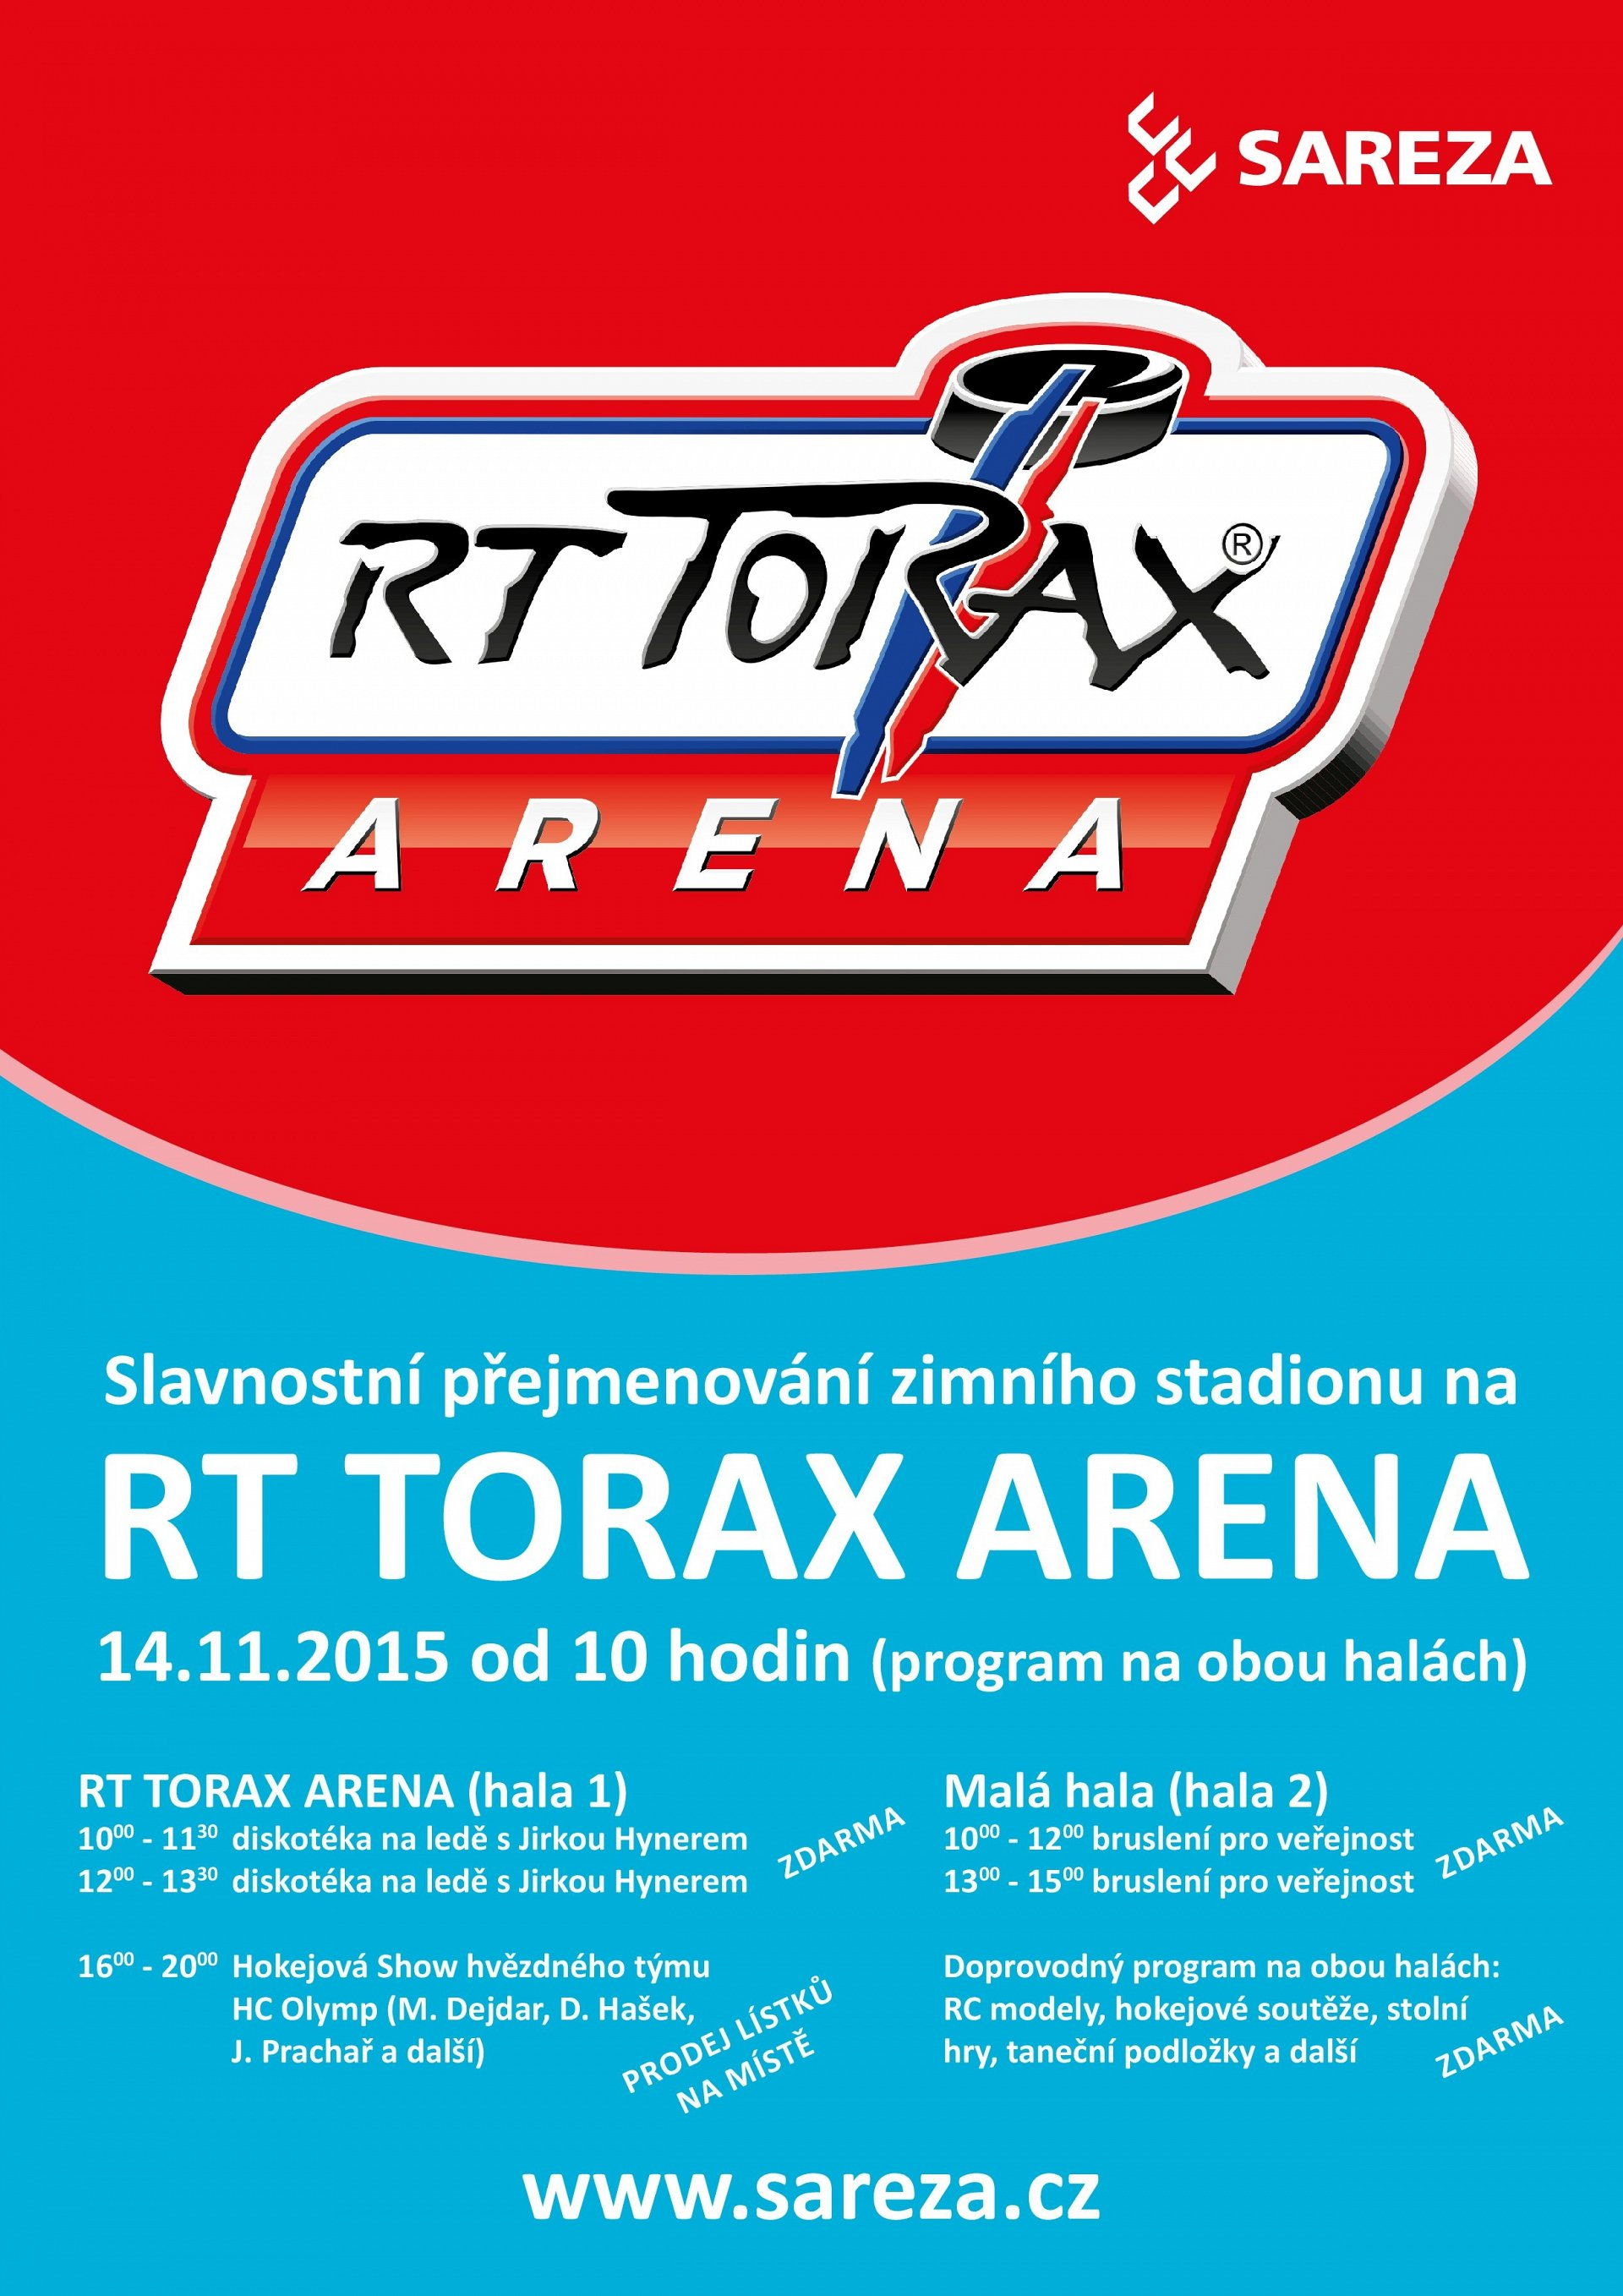 61bbc7a90e3 Zimní stadion Ostrava-Poruba Archivy - Page 2 of 3 - Sareza